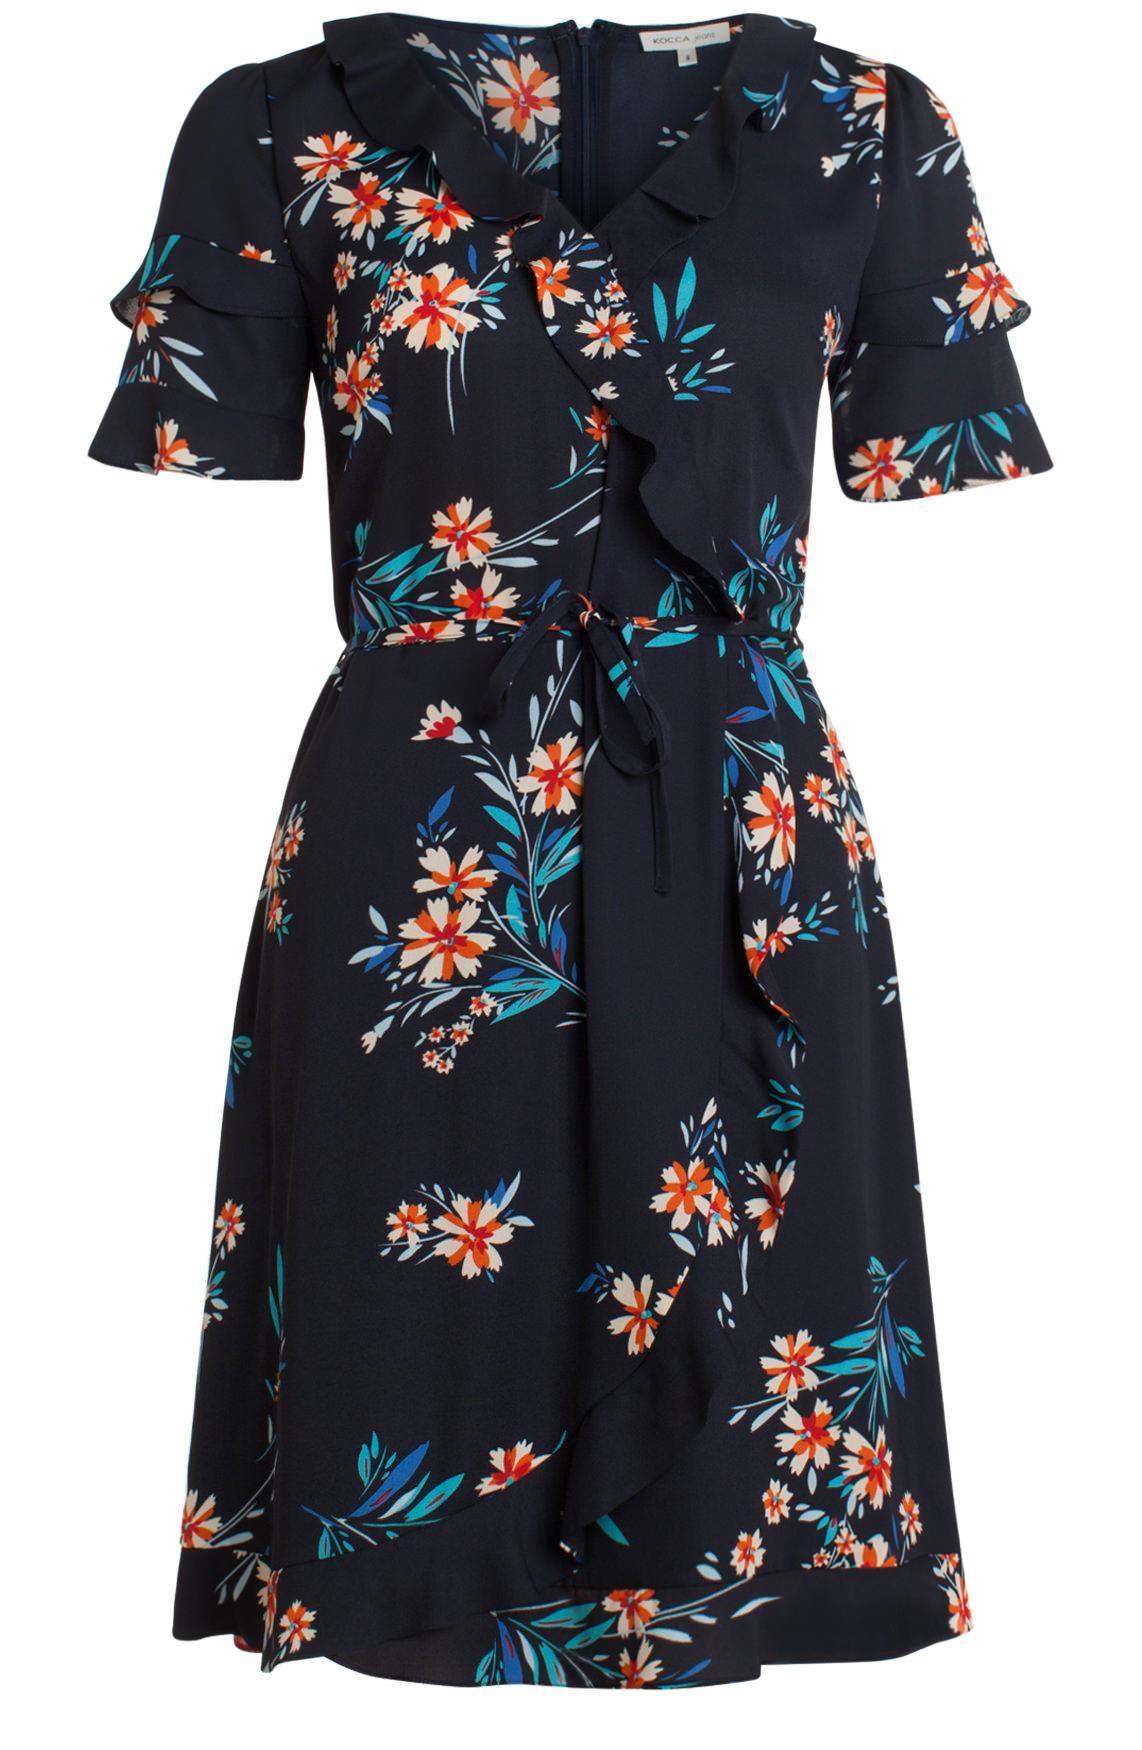 Kocca Dames Accro jurk met ruffles Blauw